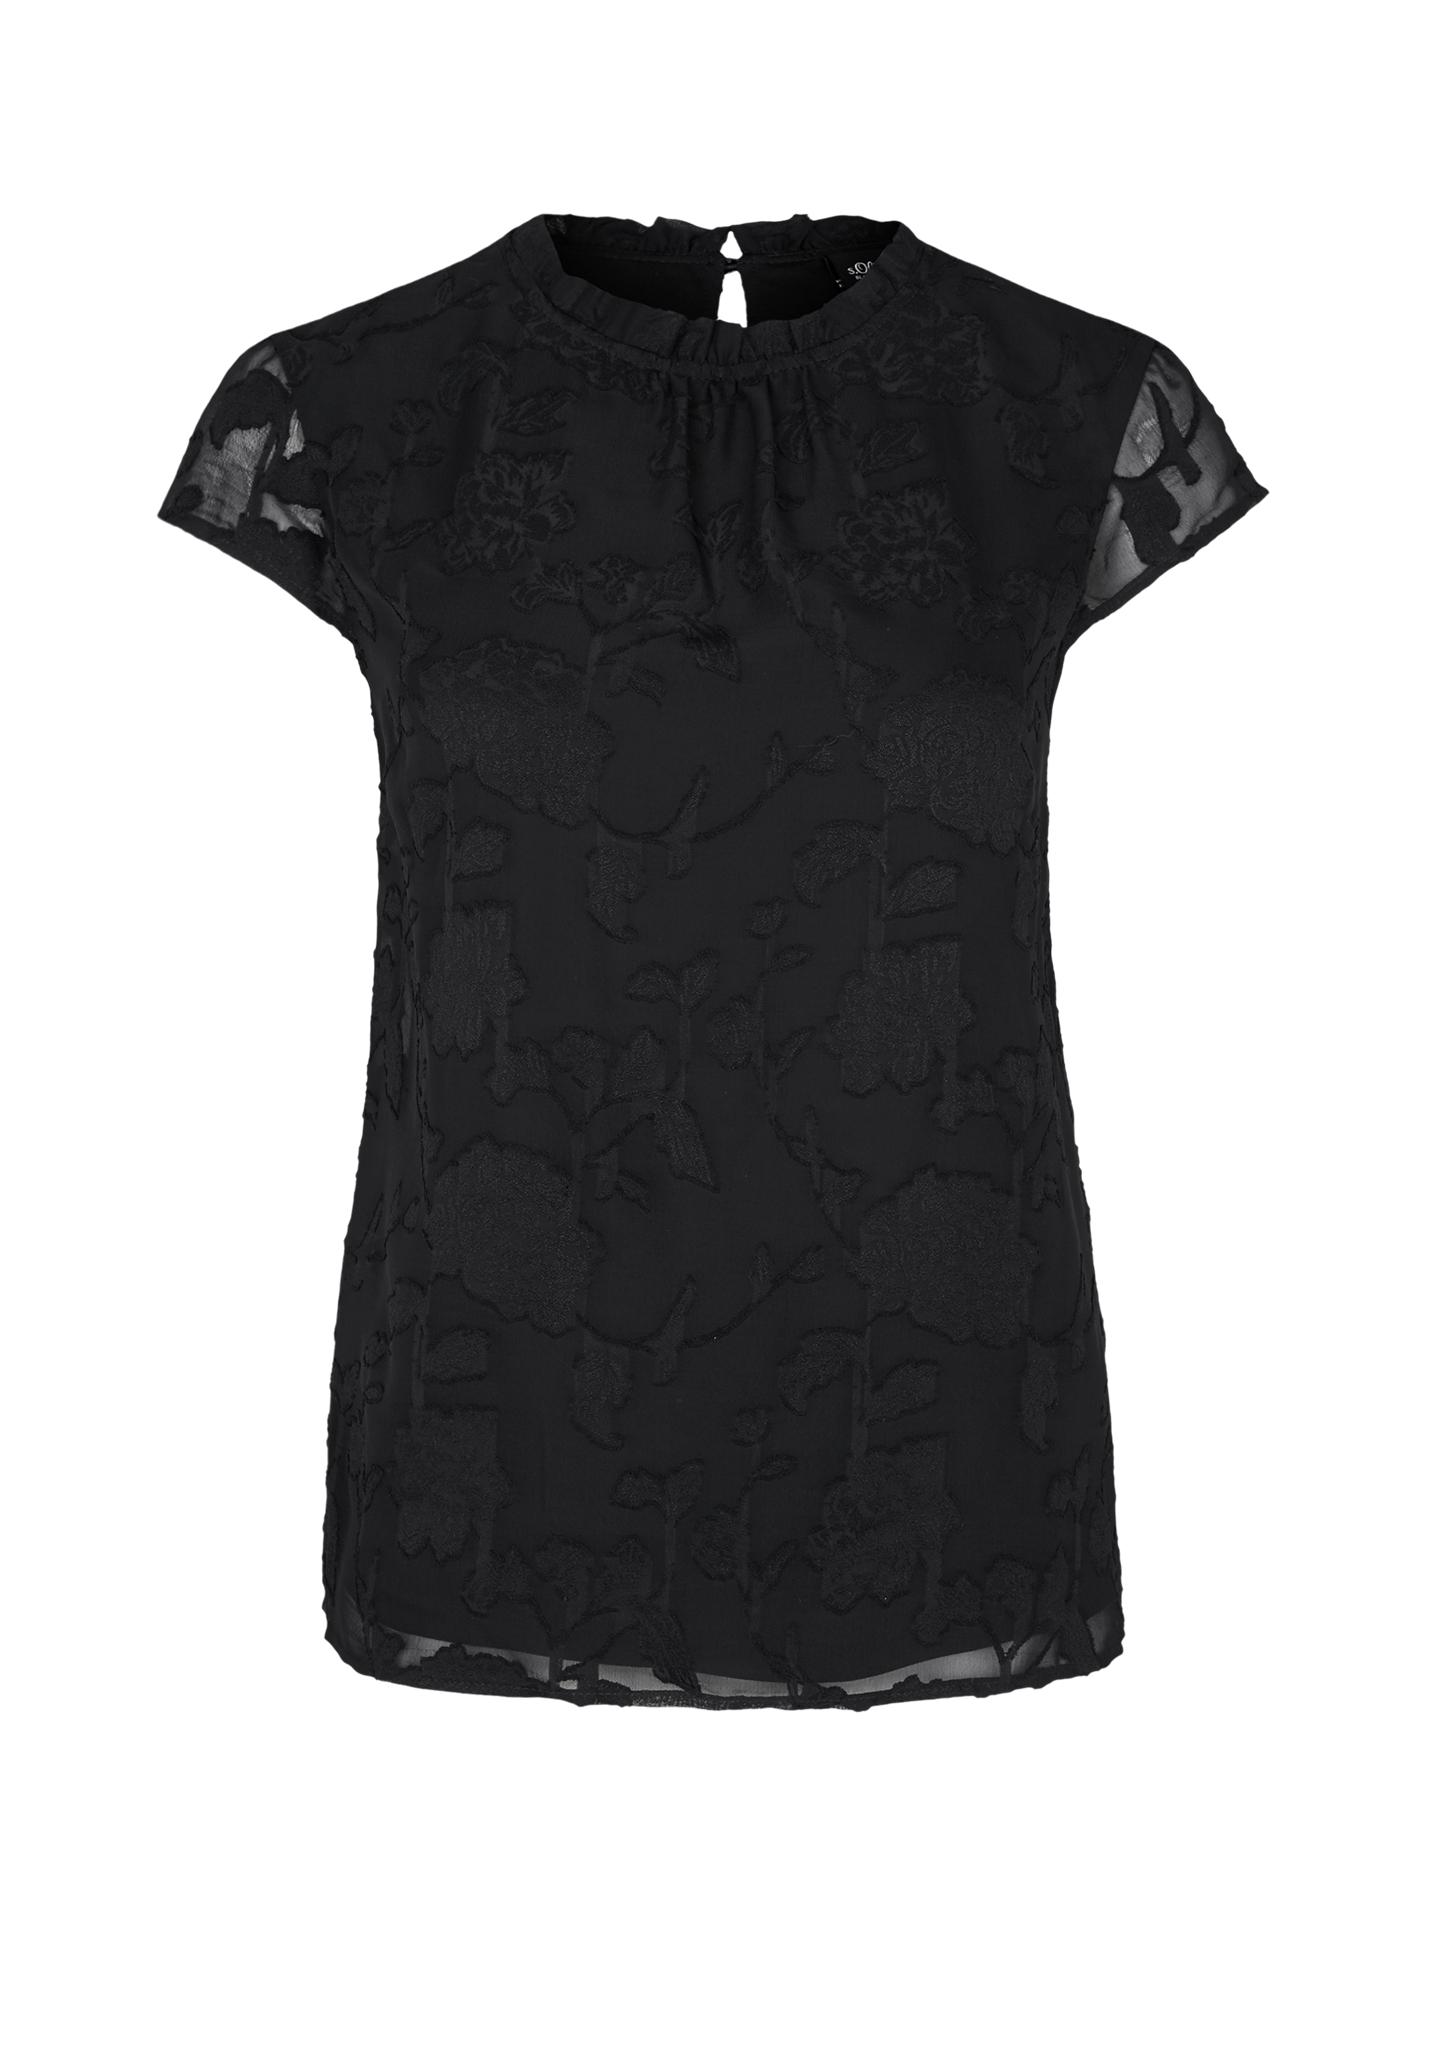 Spitzenbluse | Bekleidung > Blusen > Spitzenblusen | Grau/schwarz | Obermaterial 100% polyester| futter 100% polyester | s.Oliver BLACK LABEL